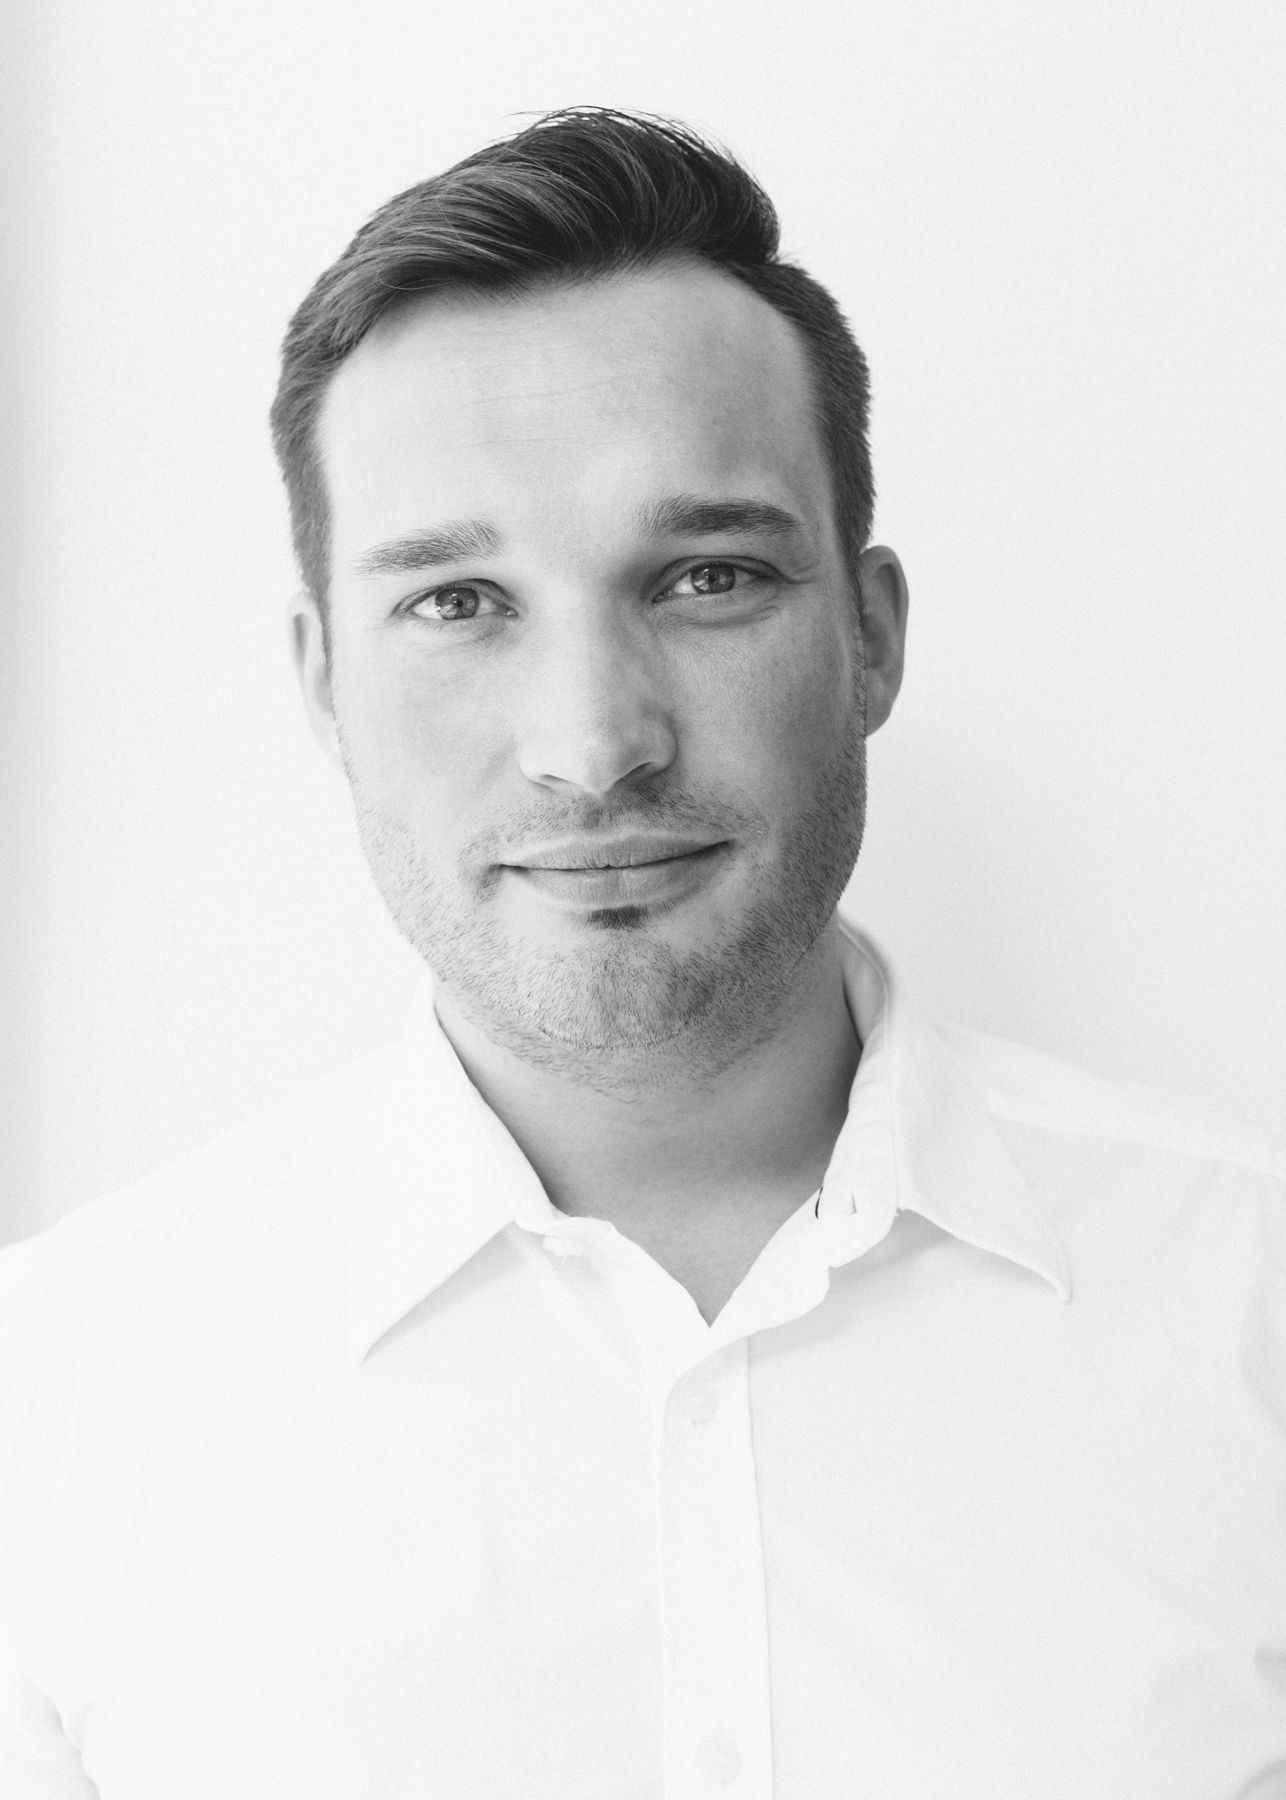 Roman Finke, Founding & Managing Partner at torq.partners